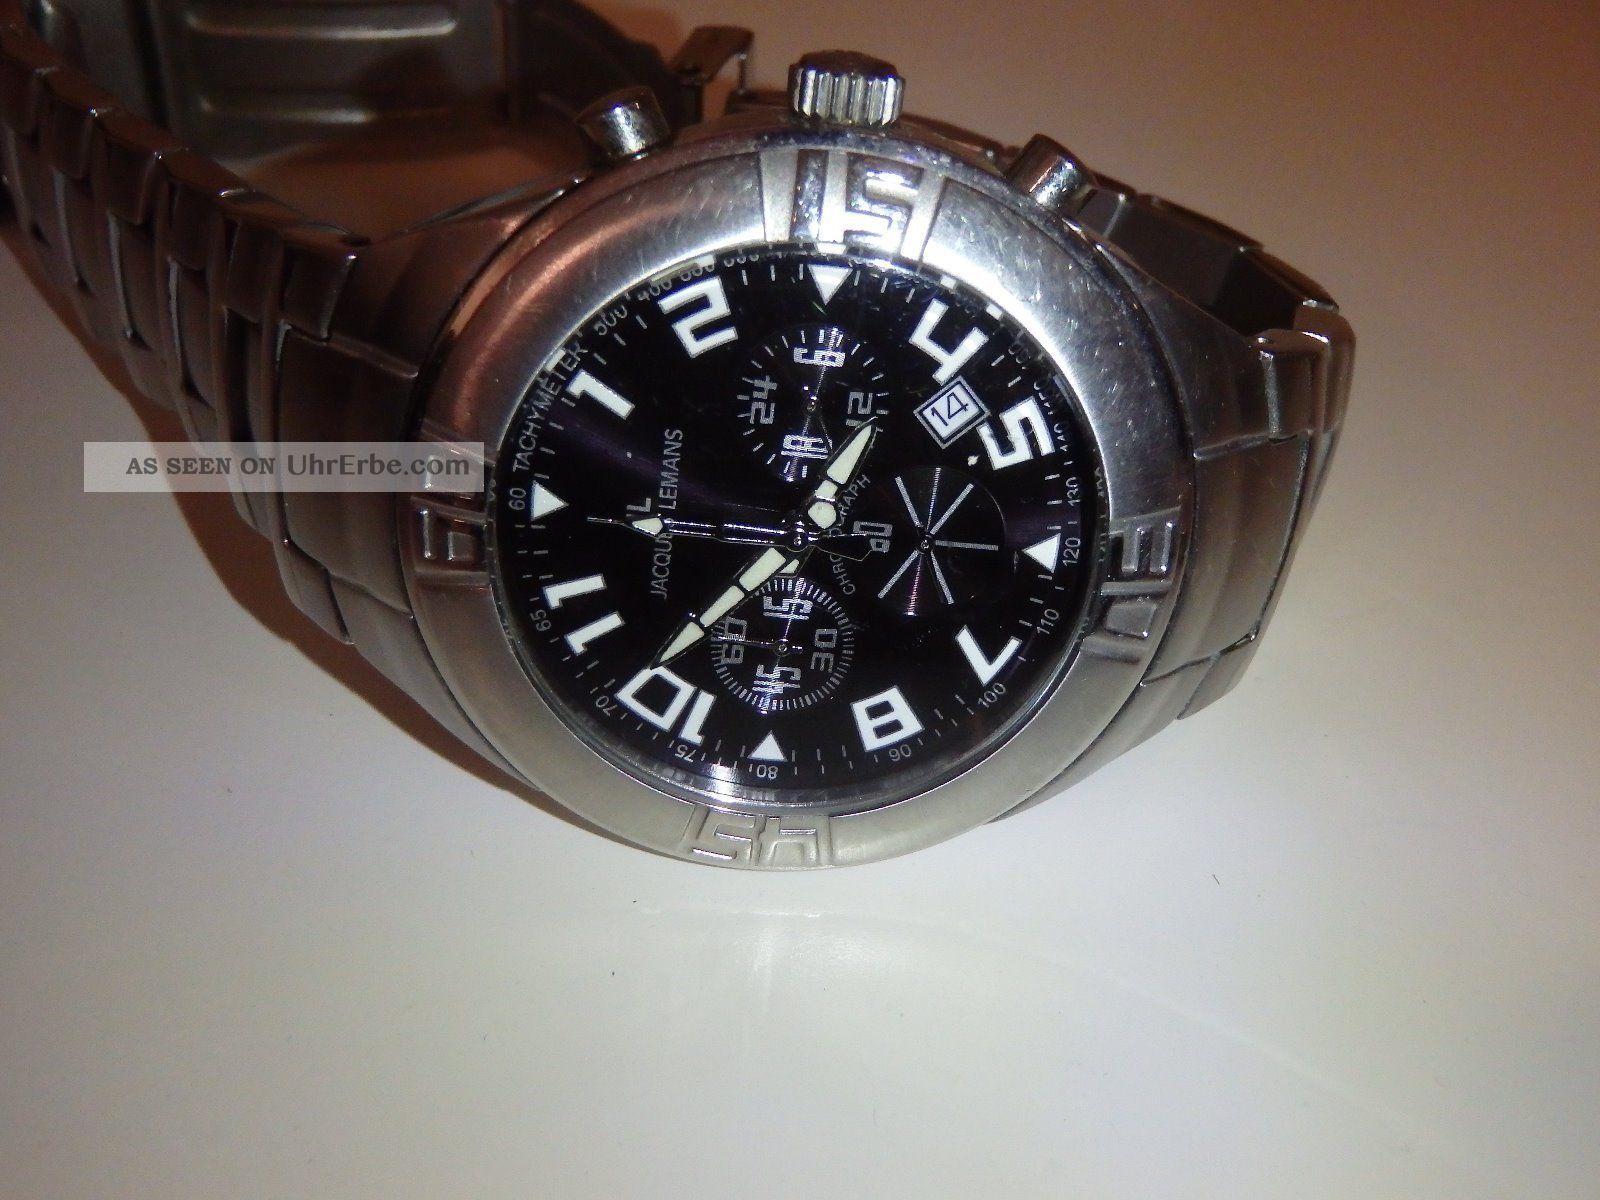 Jacques Lemans Chronograph - 1 - 1021 - Edelstahl - Schwarzes Zifferblatt Armbanduhren Bild